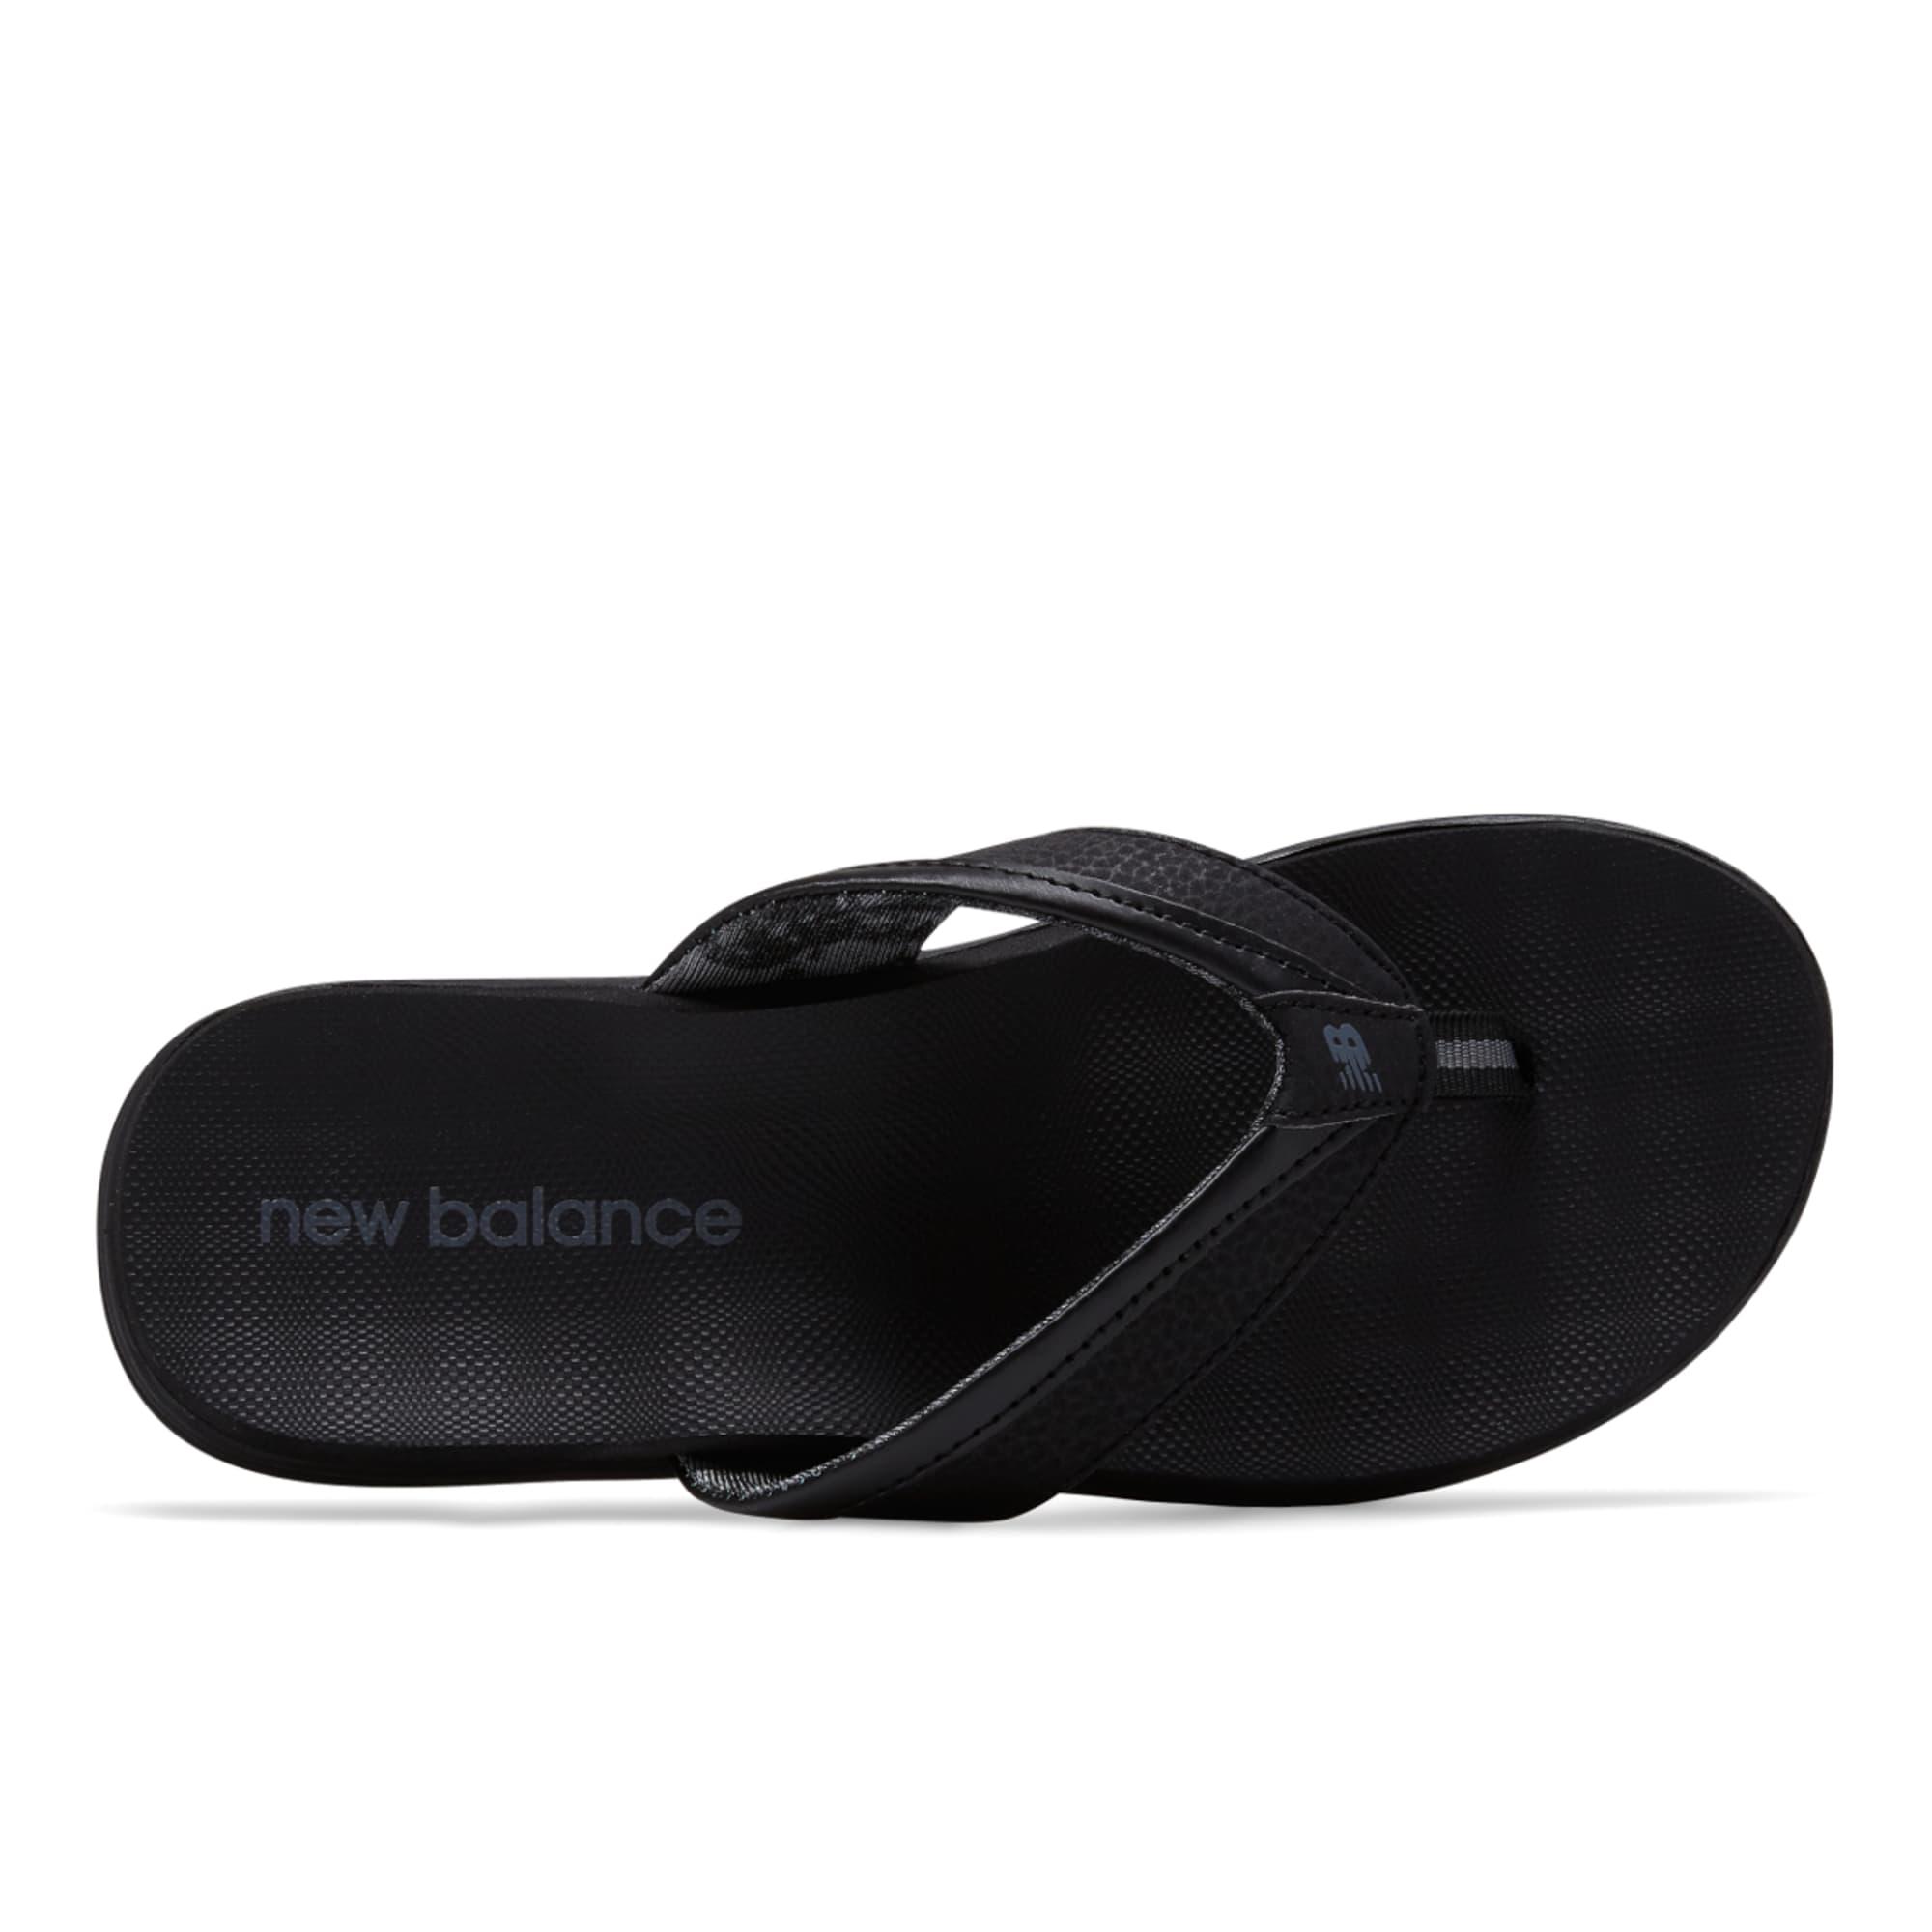 NEW BALANCE Women's Jojo Thong Sandals